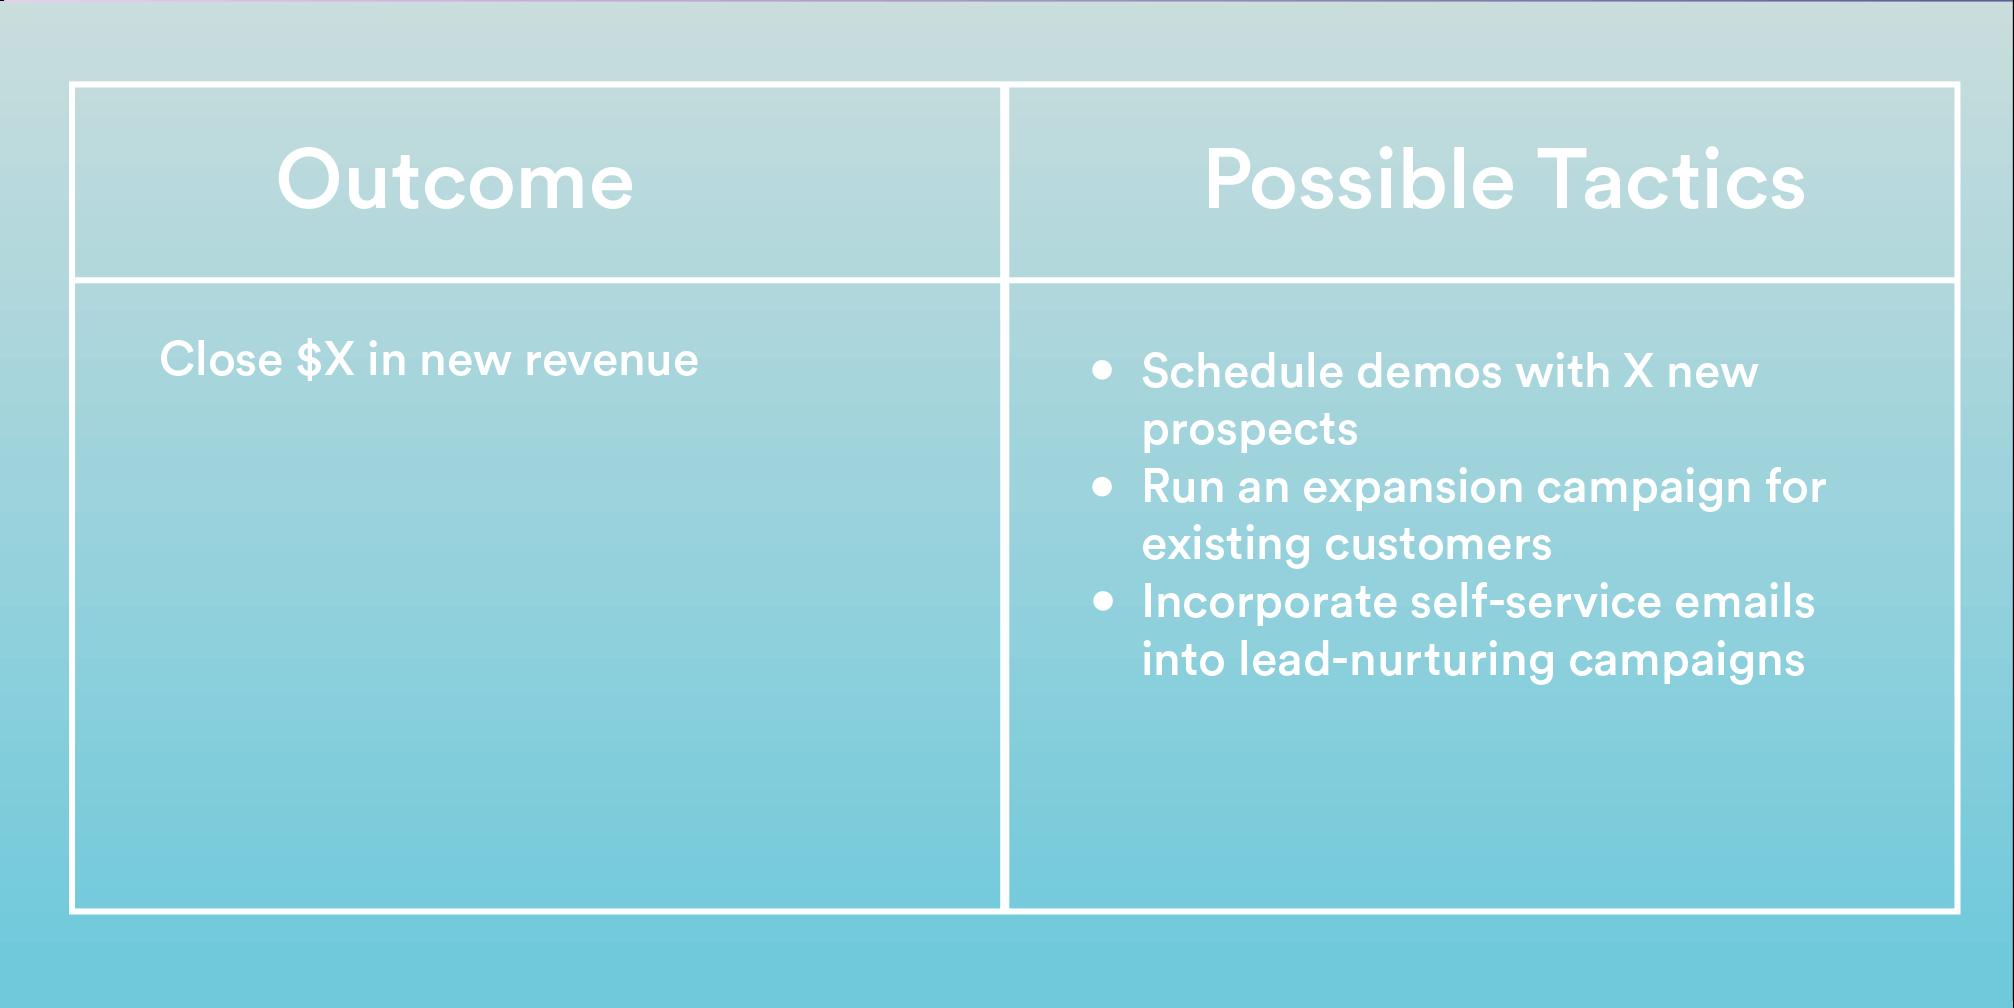 outcome_tactics3